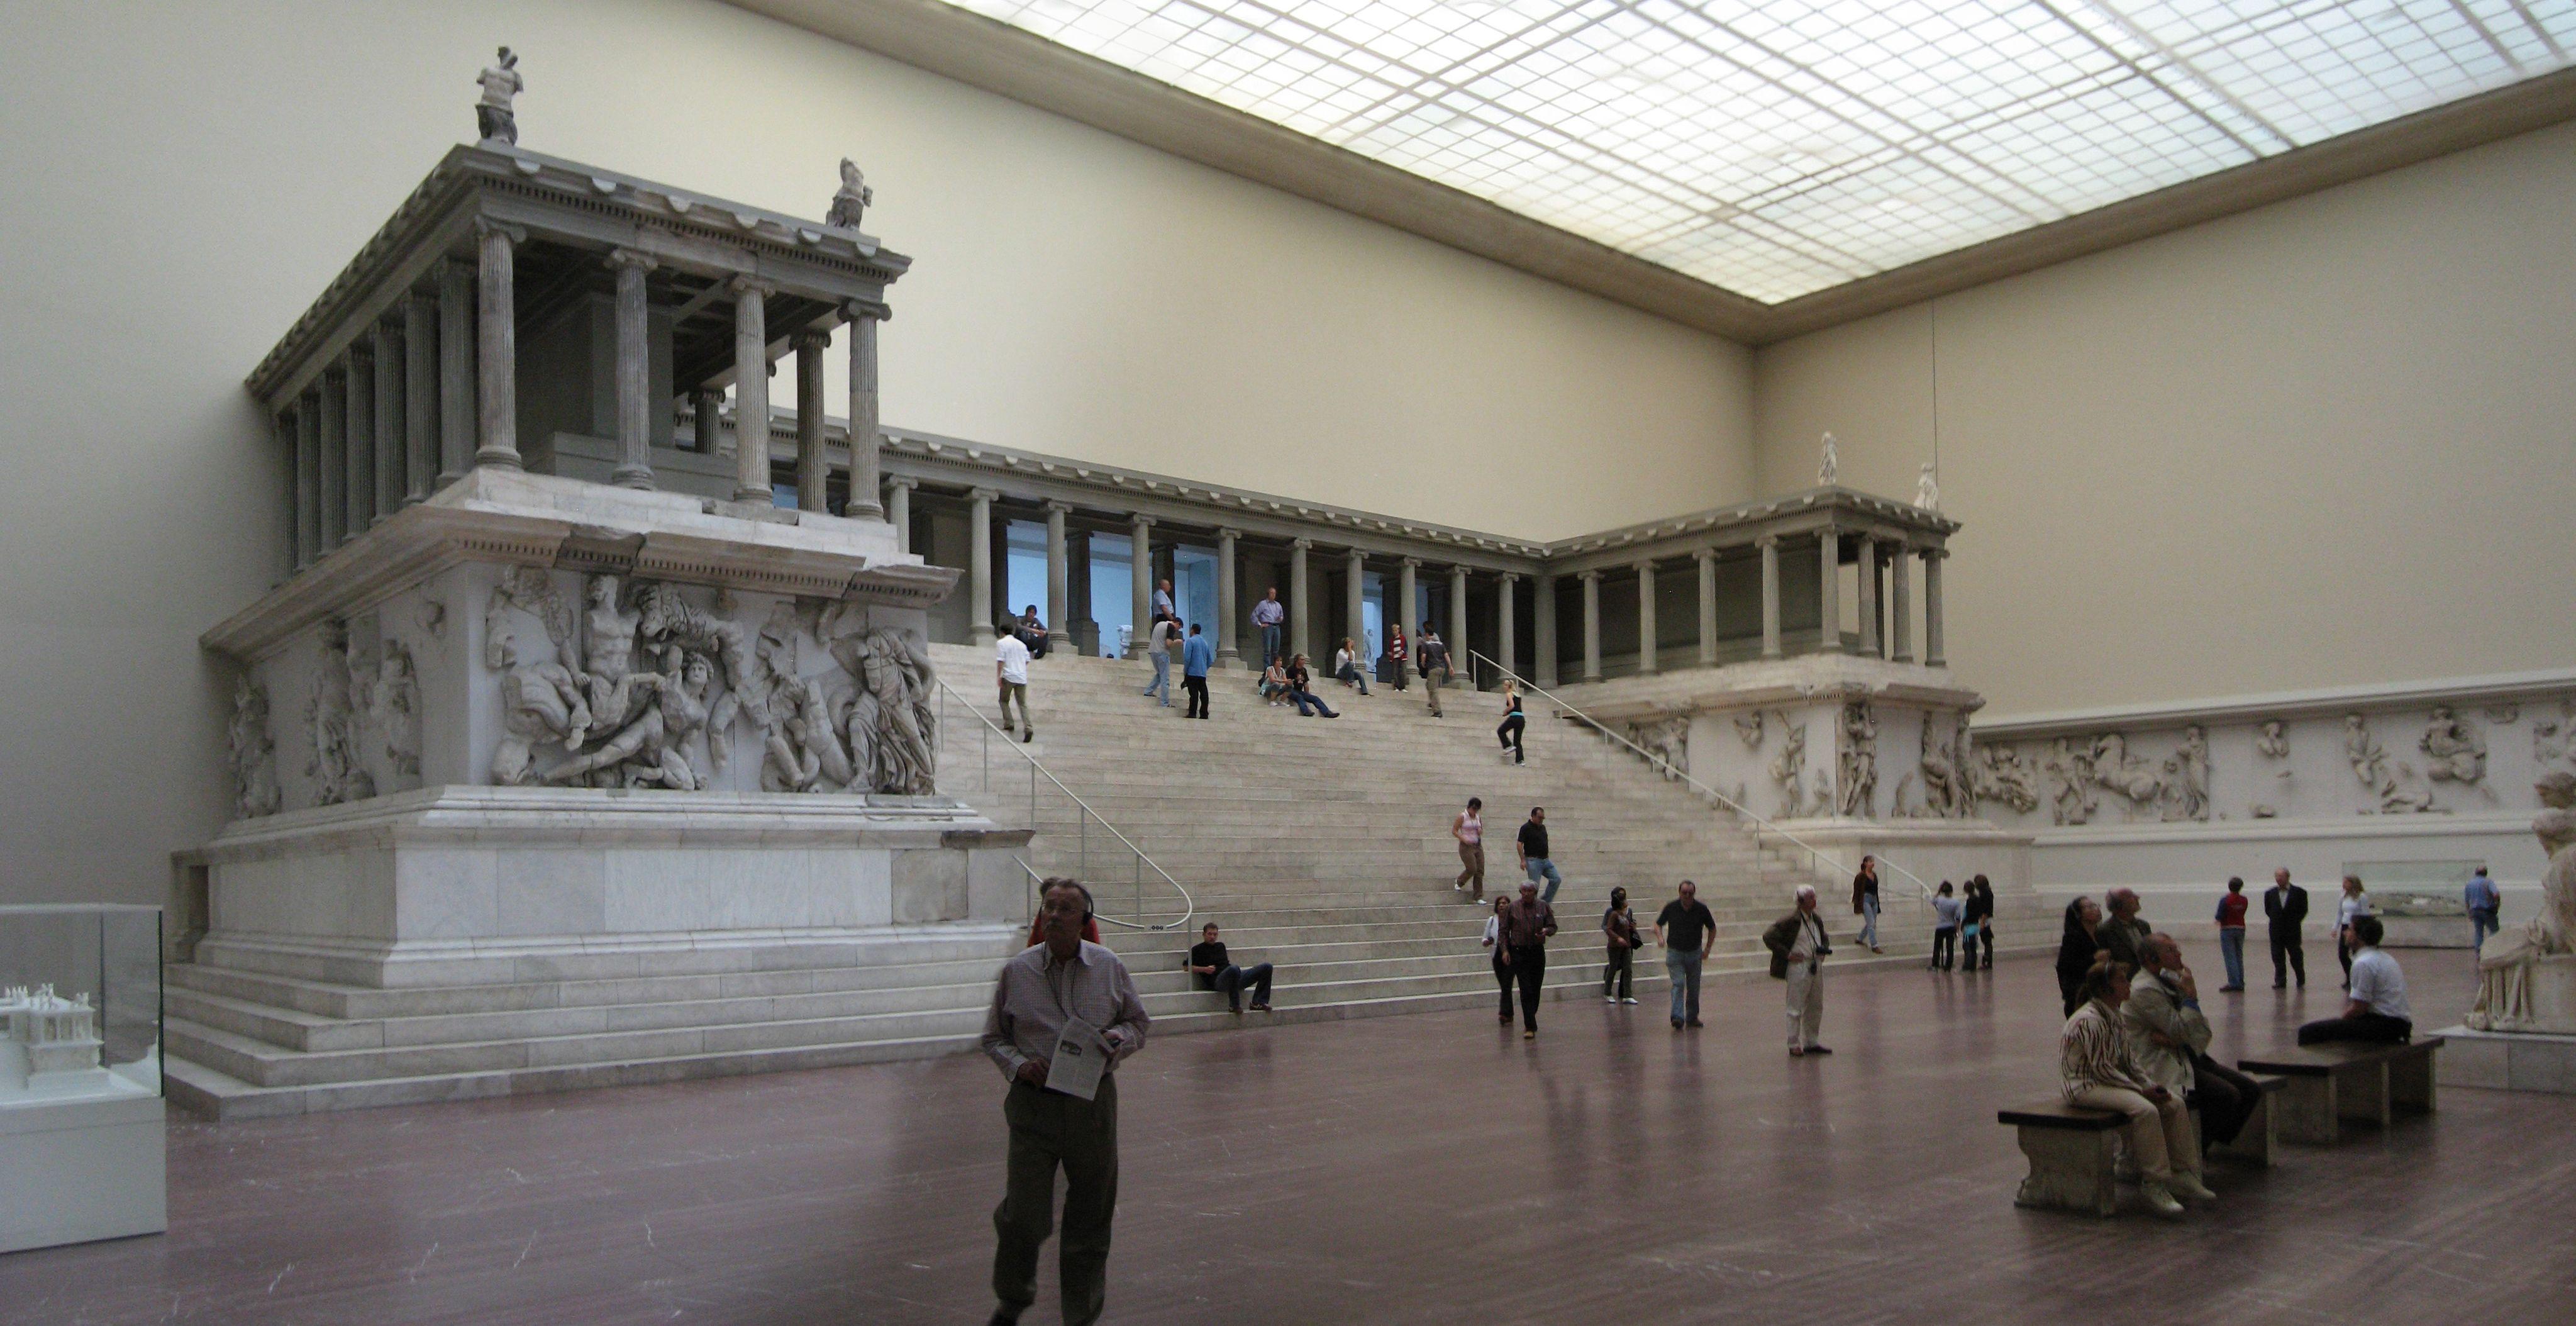 Pergamon Museum Berlin hm